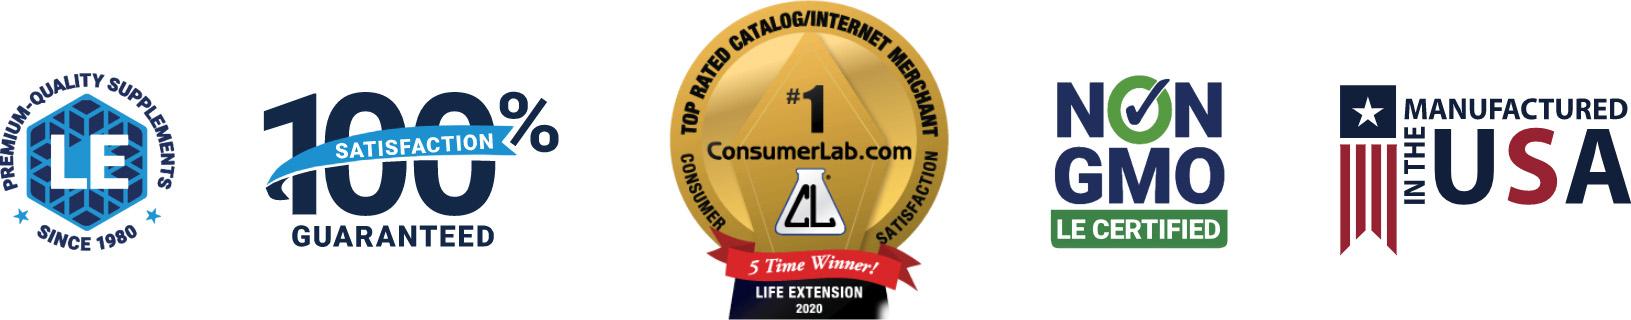 Life Extension Awards